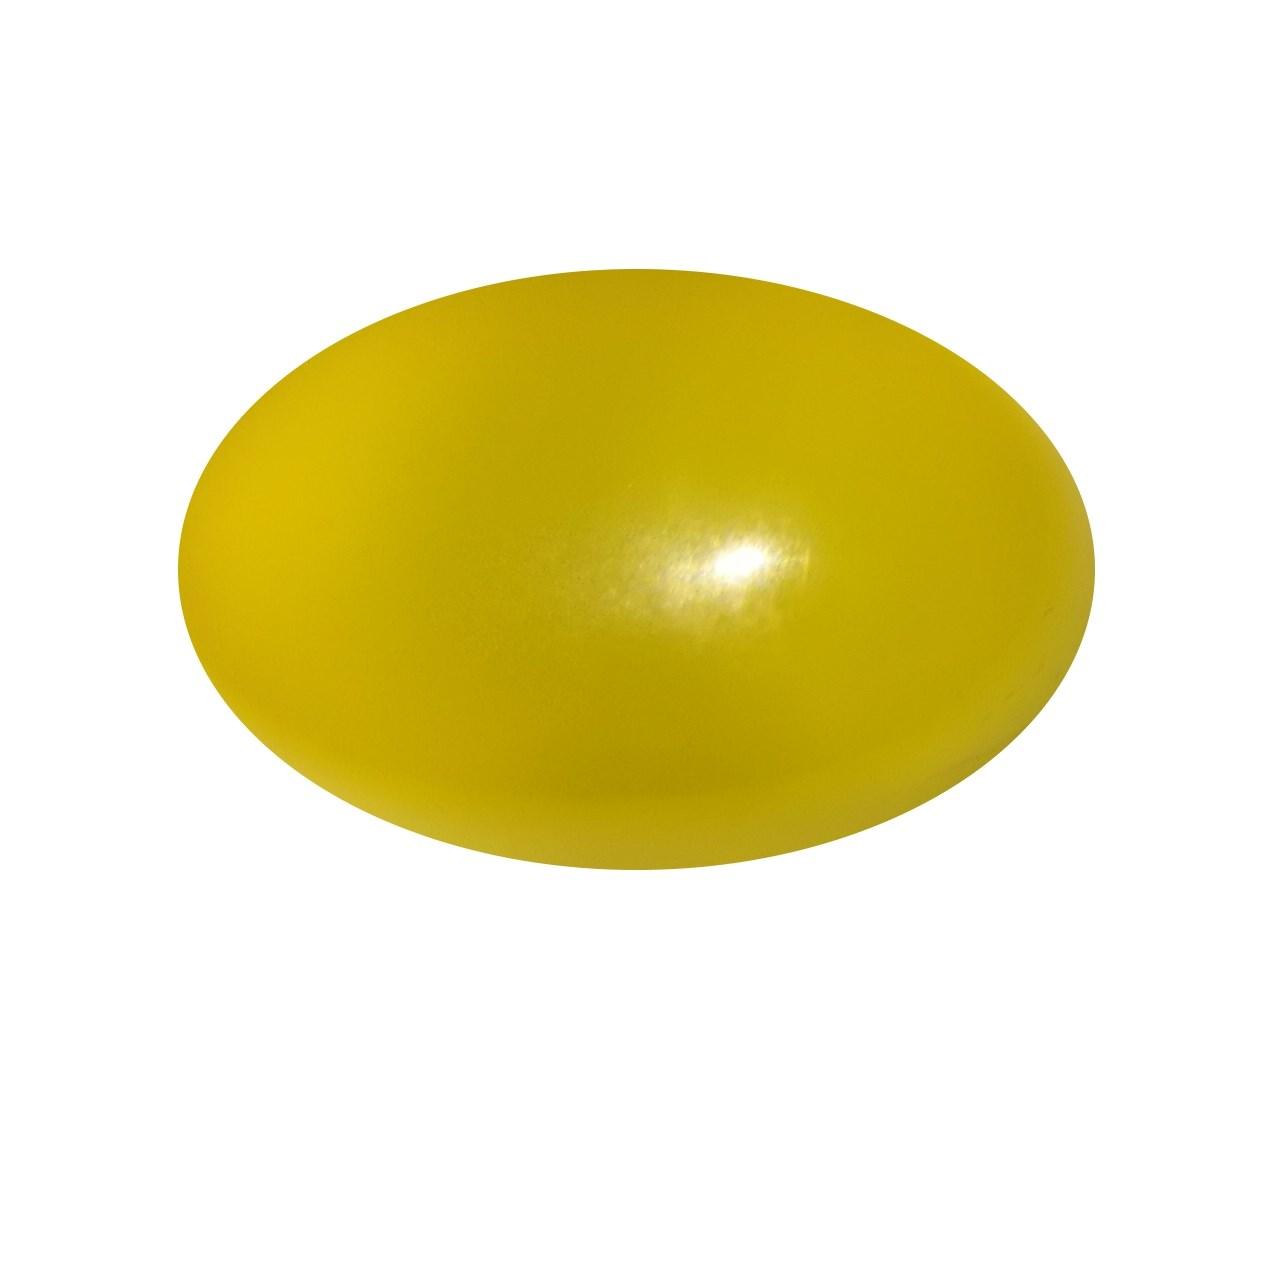 سنگ عقیق مدل شرف شمس کد 1364